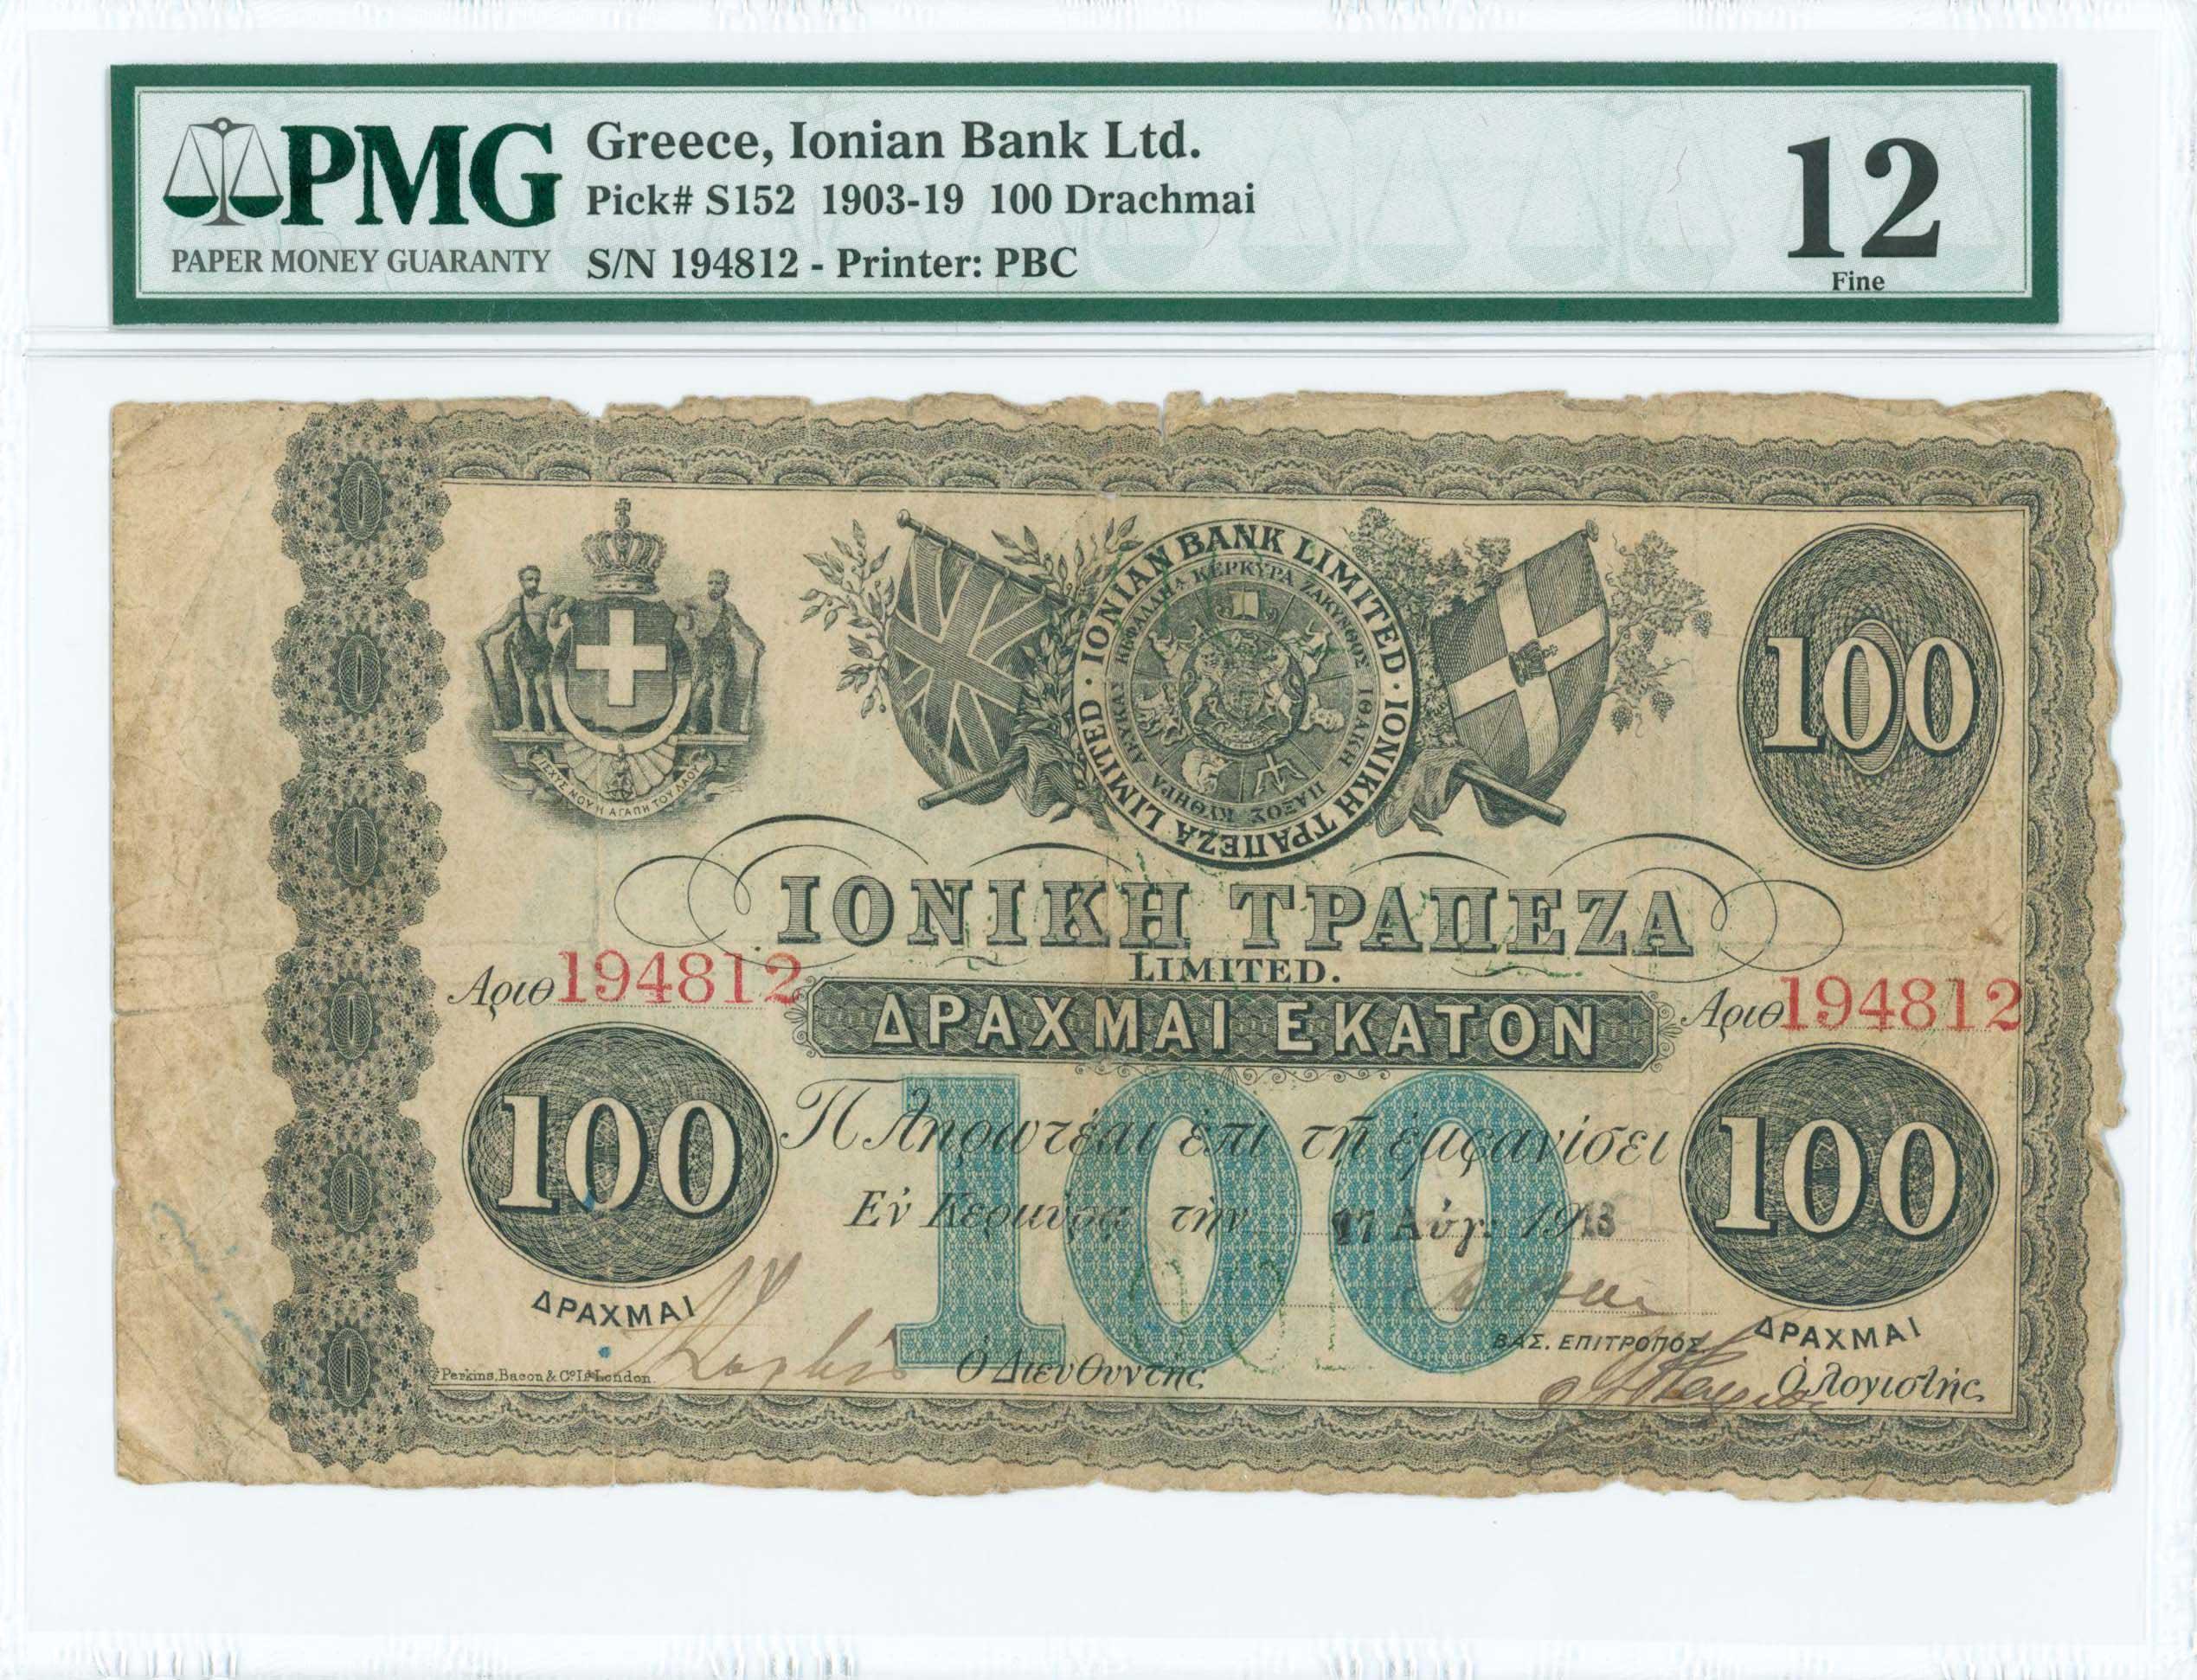 Lot 6443 - -  PAPER MONEY - BANKNOTES ionian bank -  A. Karamitsos Public & Live Internet Auction 671 (Part A)